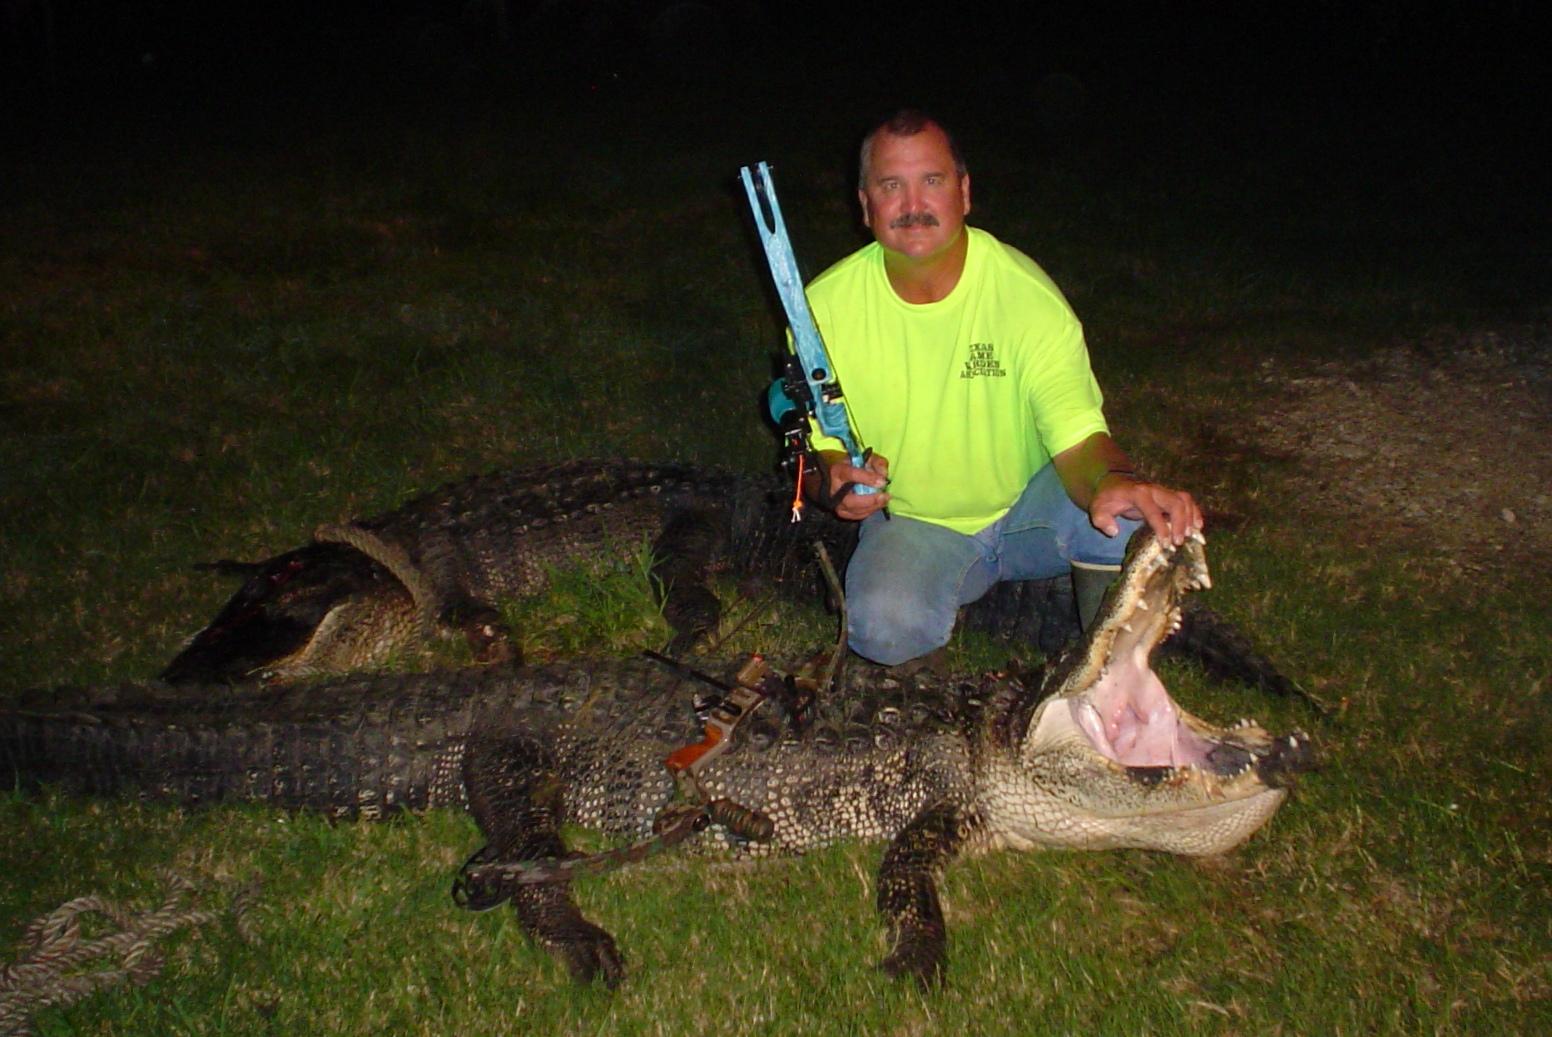 Bob Kana Gator 370 lbs.Cropped